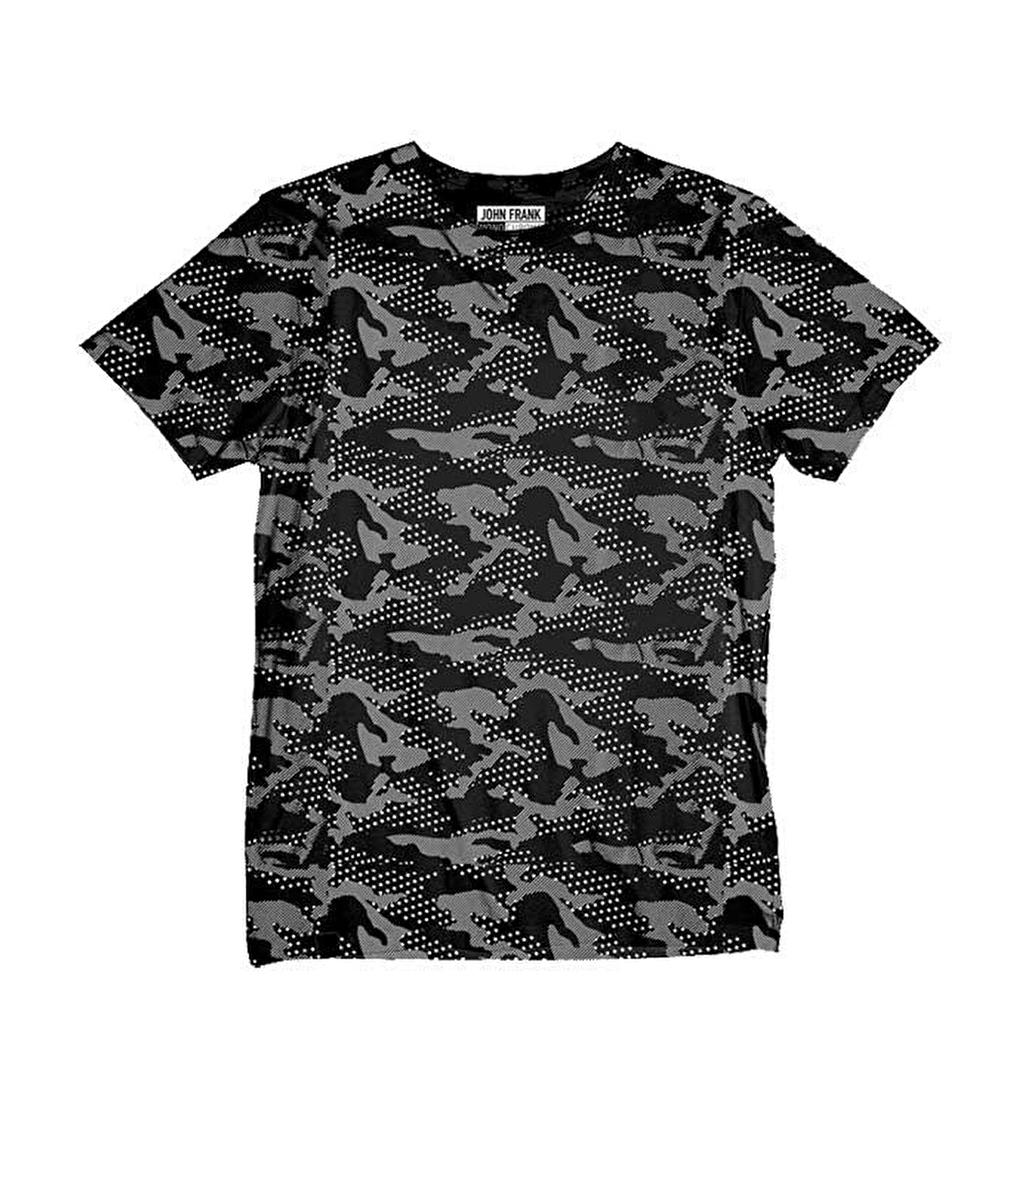 John Frank Monochrome T-Shirt Camo Star